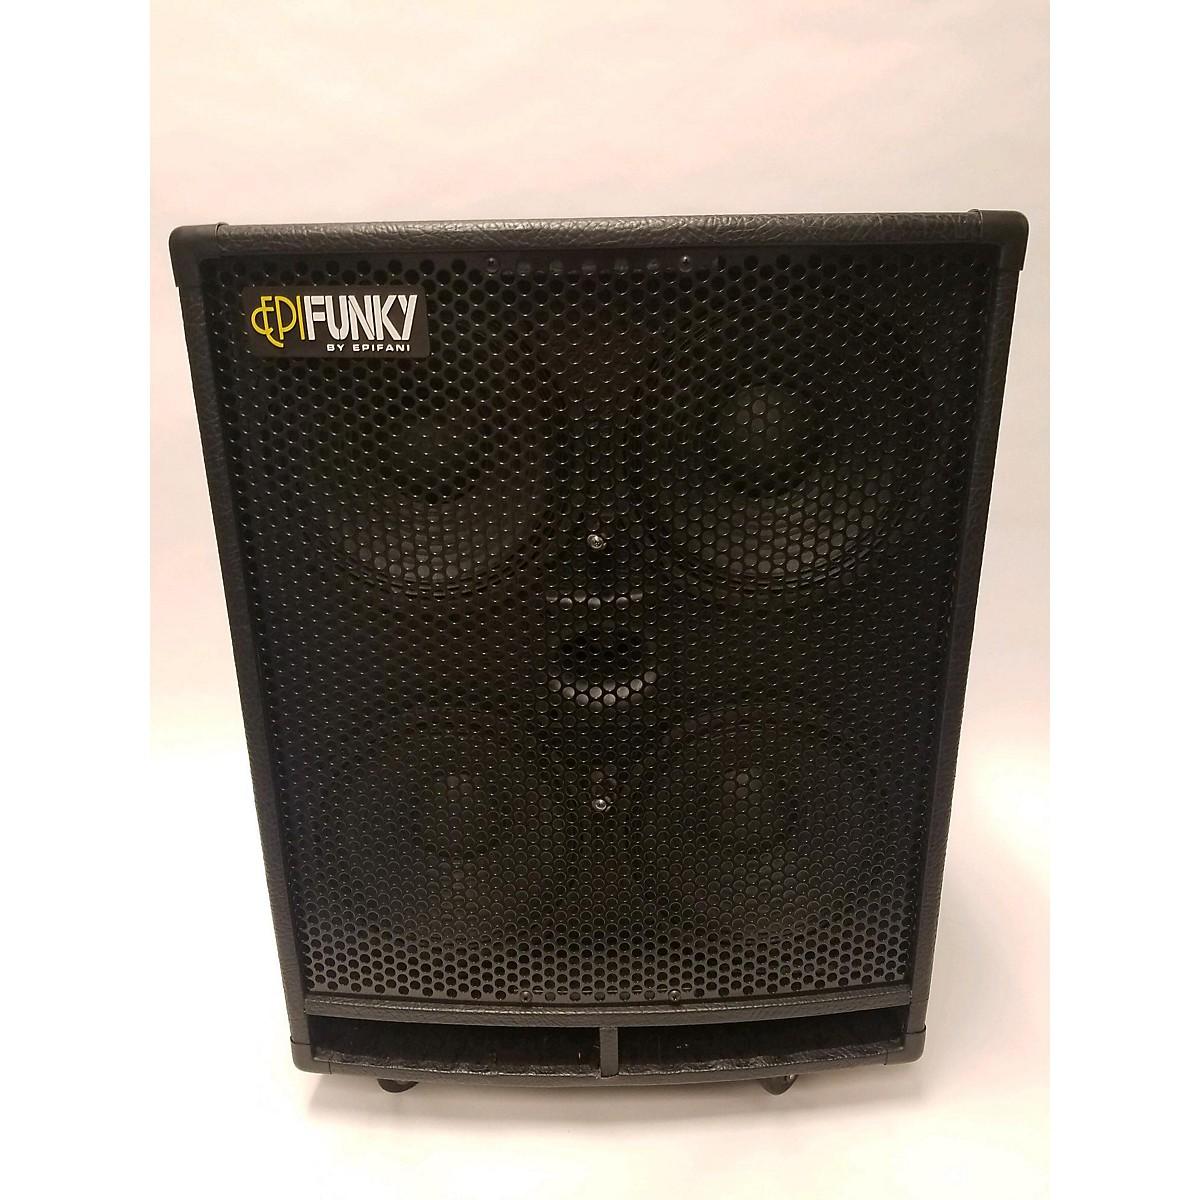 Epifani Epifunky 4x10 Bass Cabinet